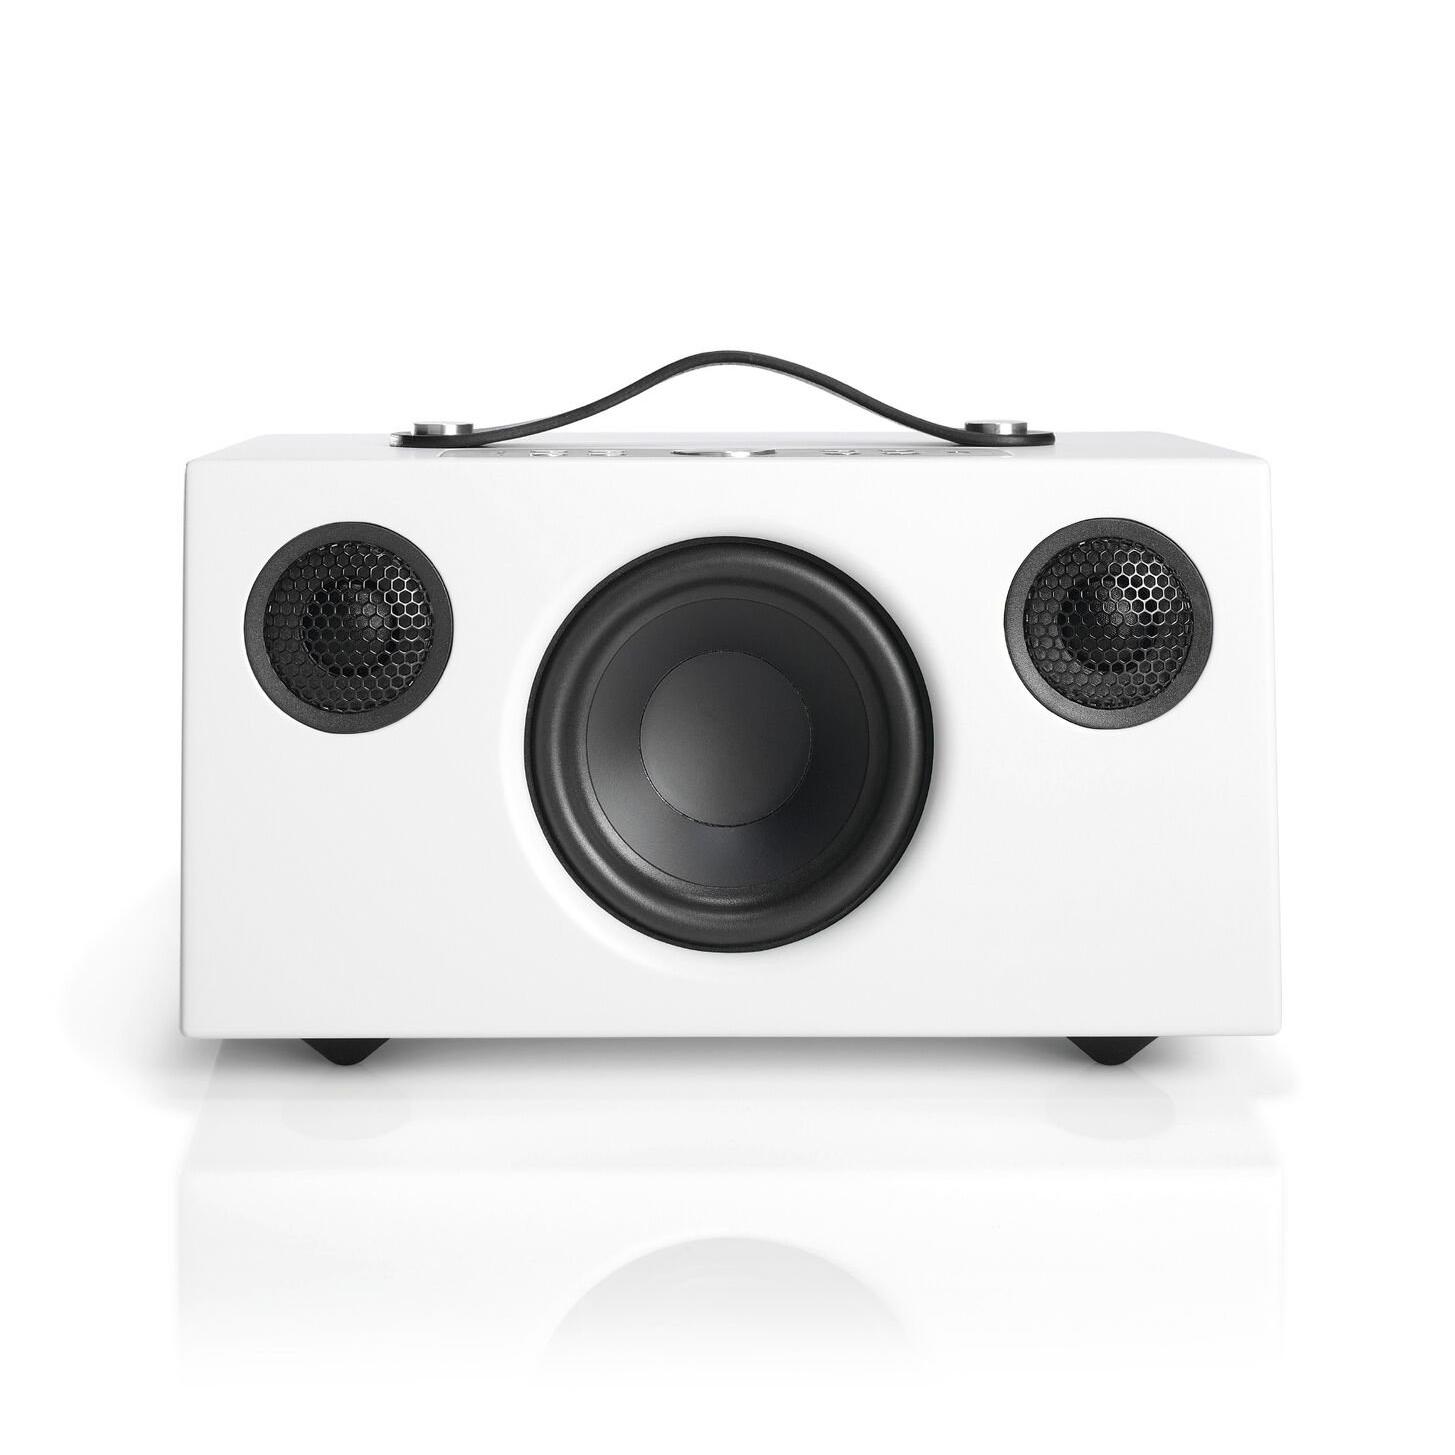 Image of Audio Pro Addon C5 Bluetooth Multiroom Speaker in White